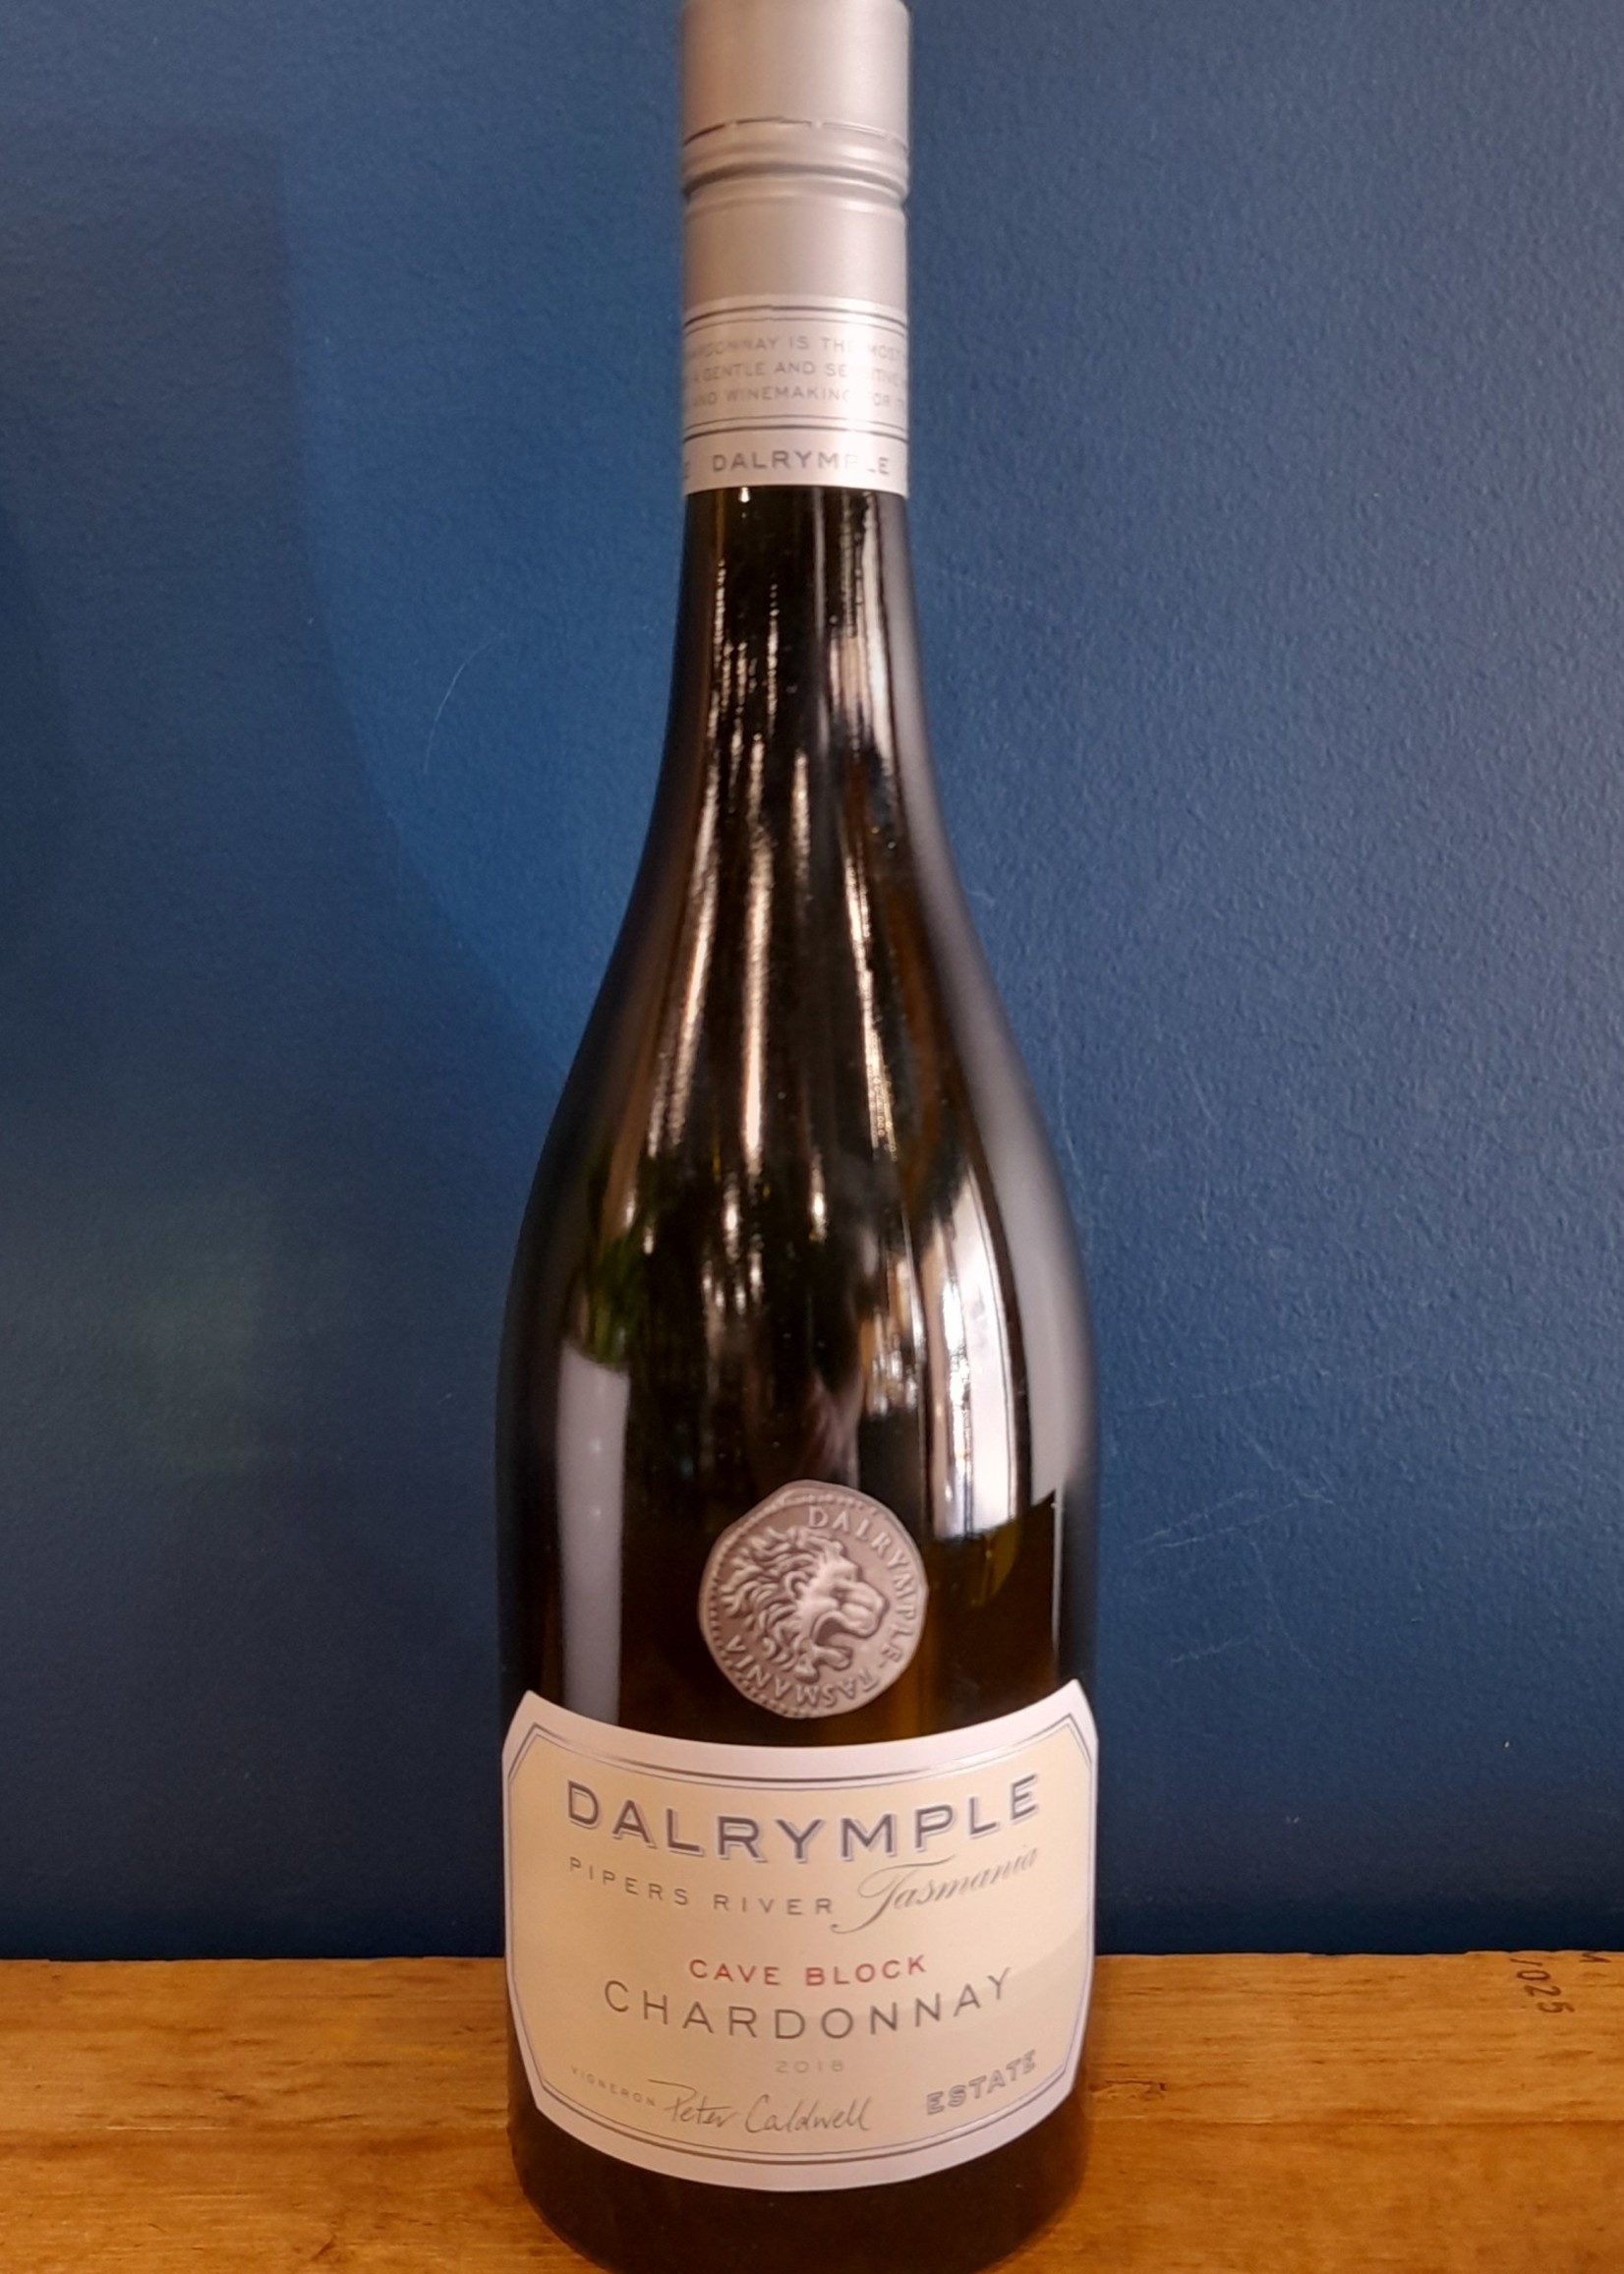 Dalrymple Dalrymple Cave Block Chardonnay 2018